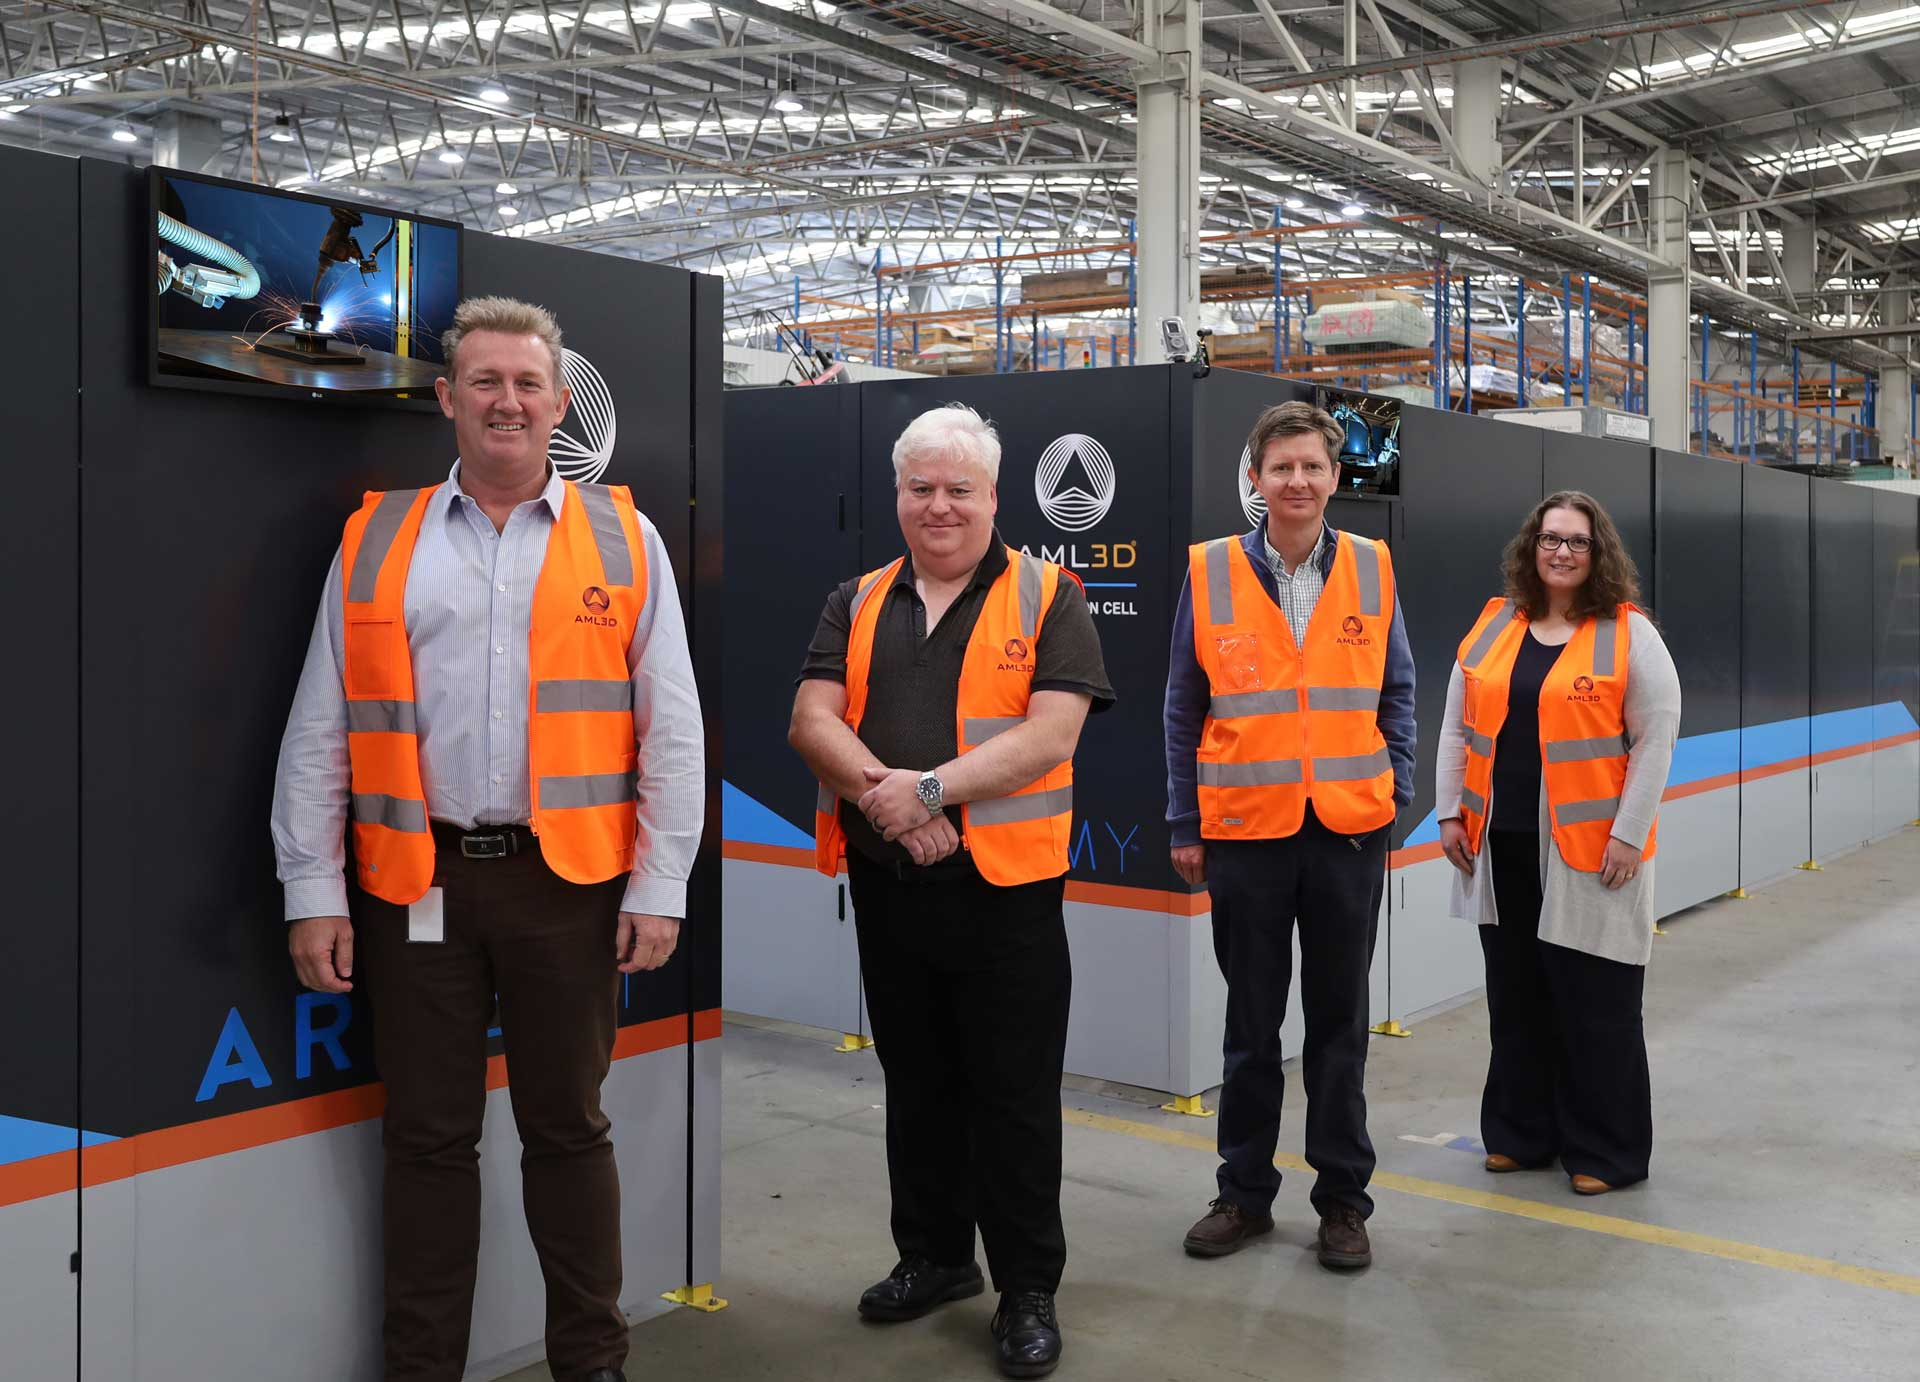 Flinders University visits AML3D Adelaide Facility